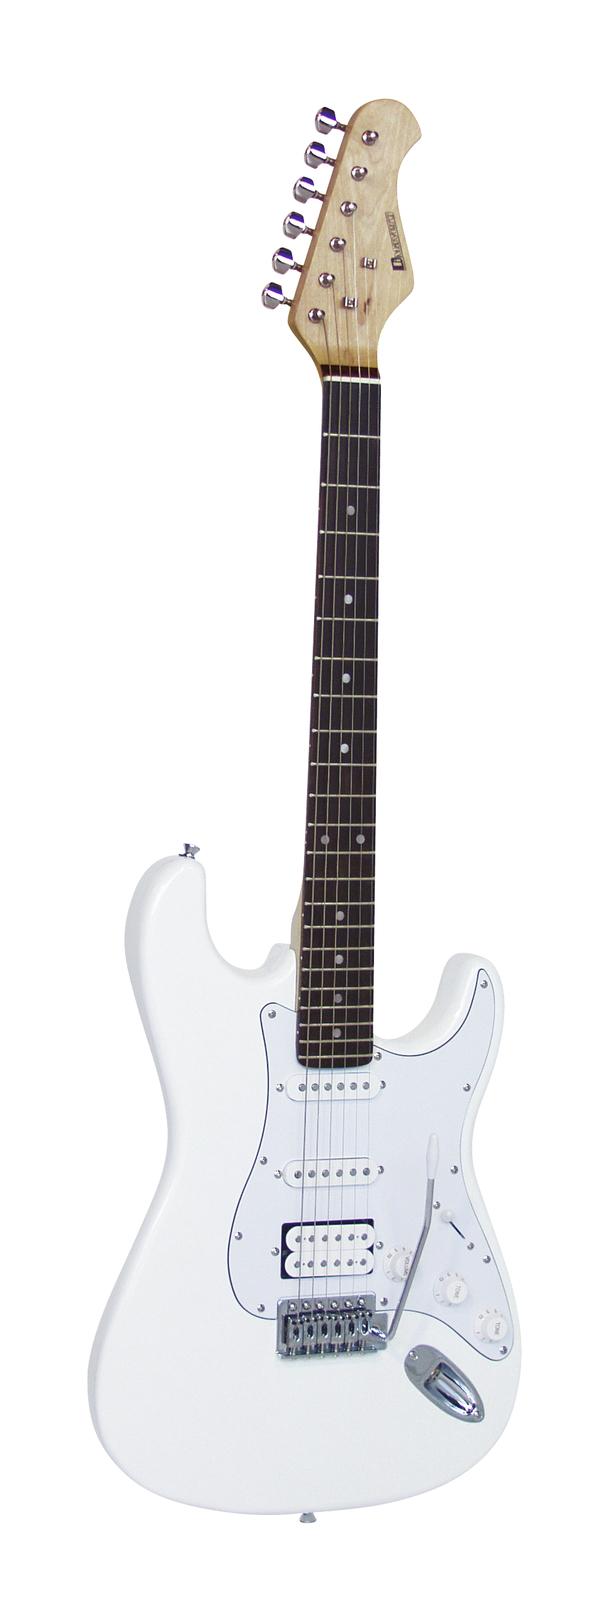 DIMAVERY ST-312 E-Gitarre, weiß